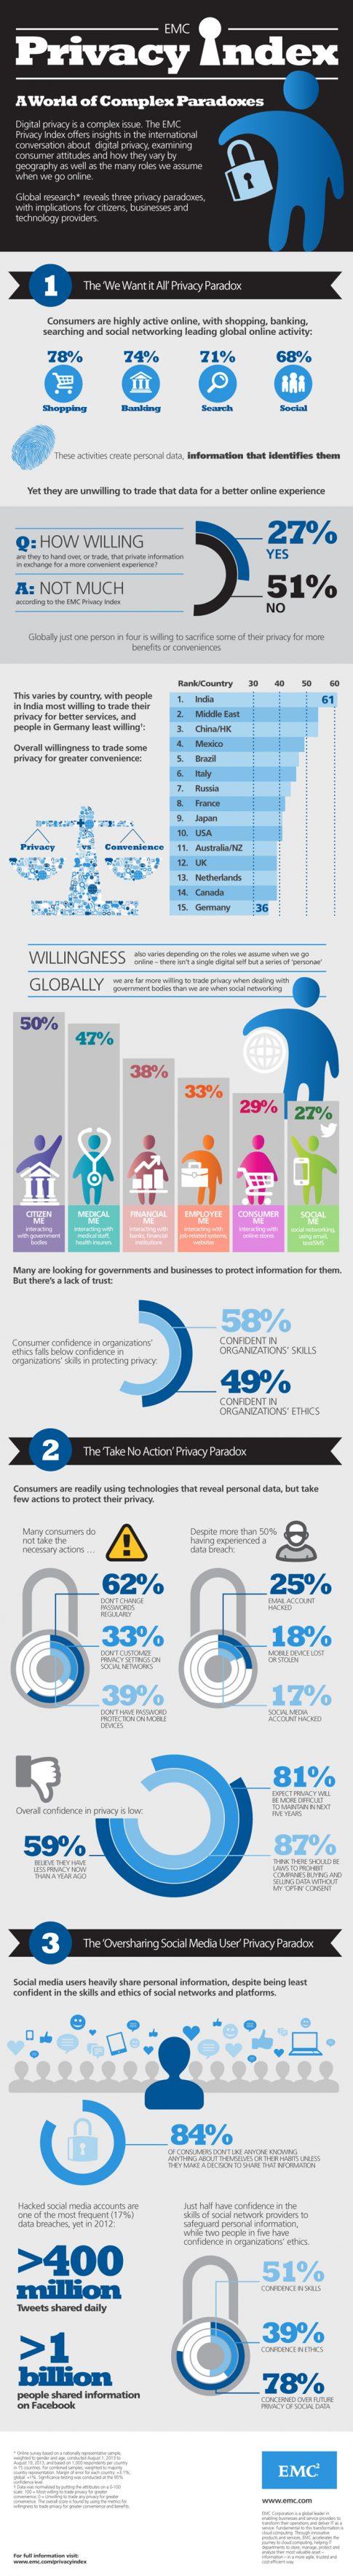 fot. emc.com/campaign/privacy-index/global.htm